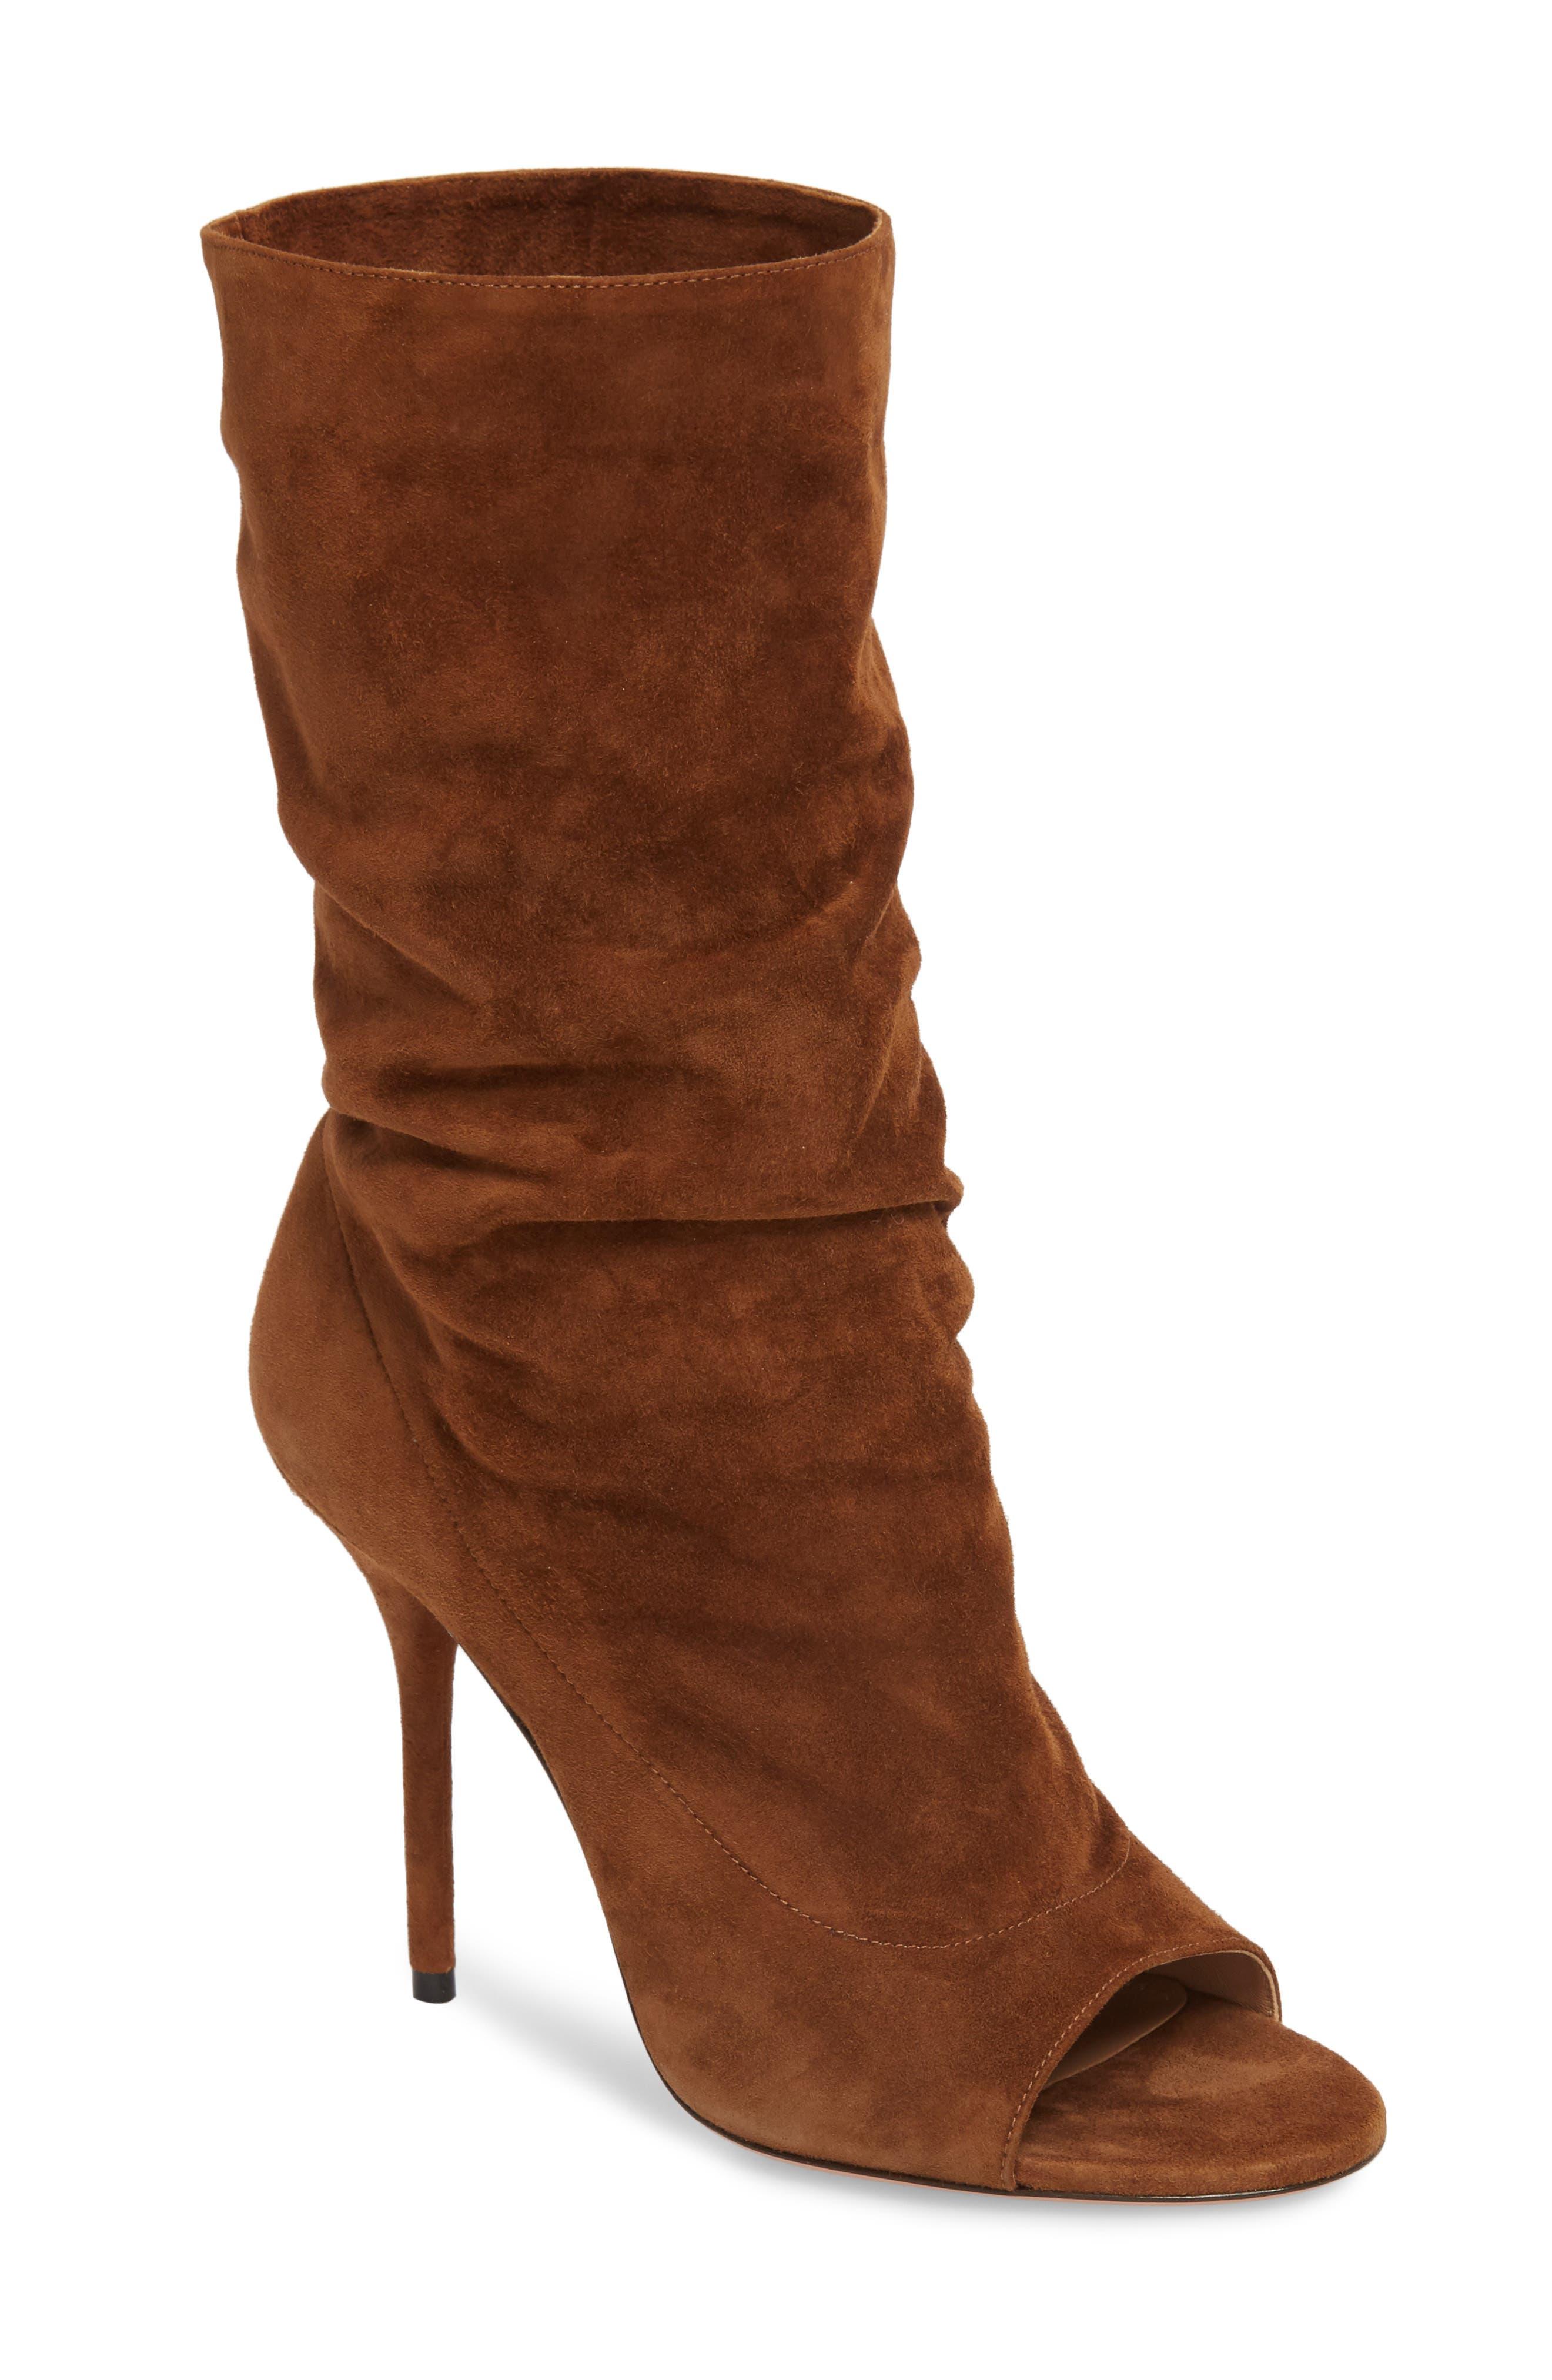 Alternate Image 1 Selected - Aquazzura Touché Open Toe Boot (Women)